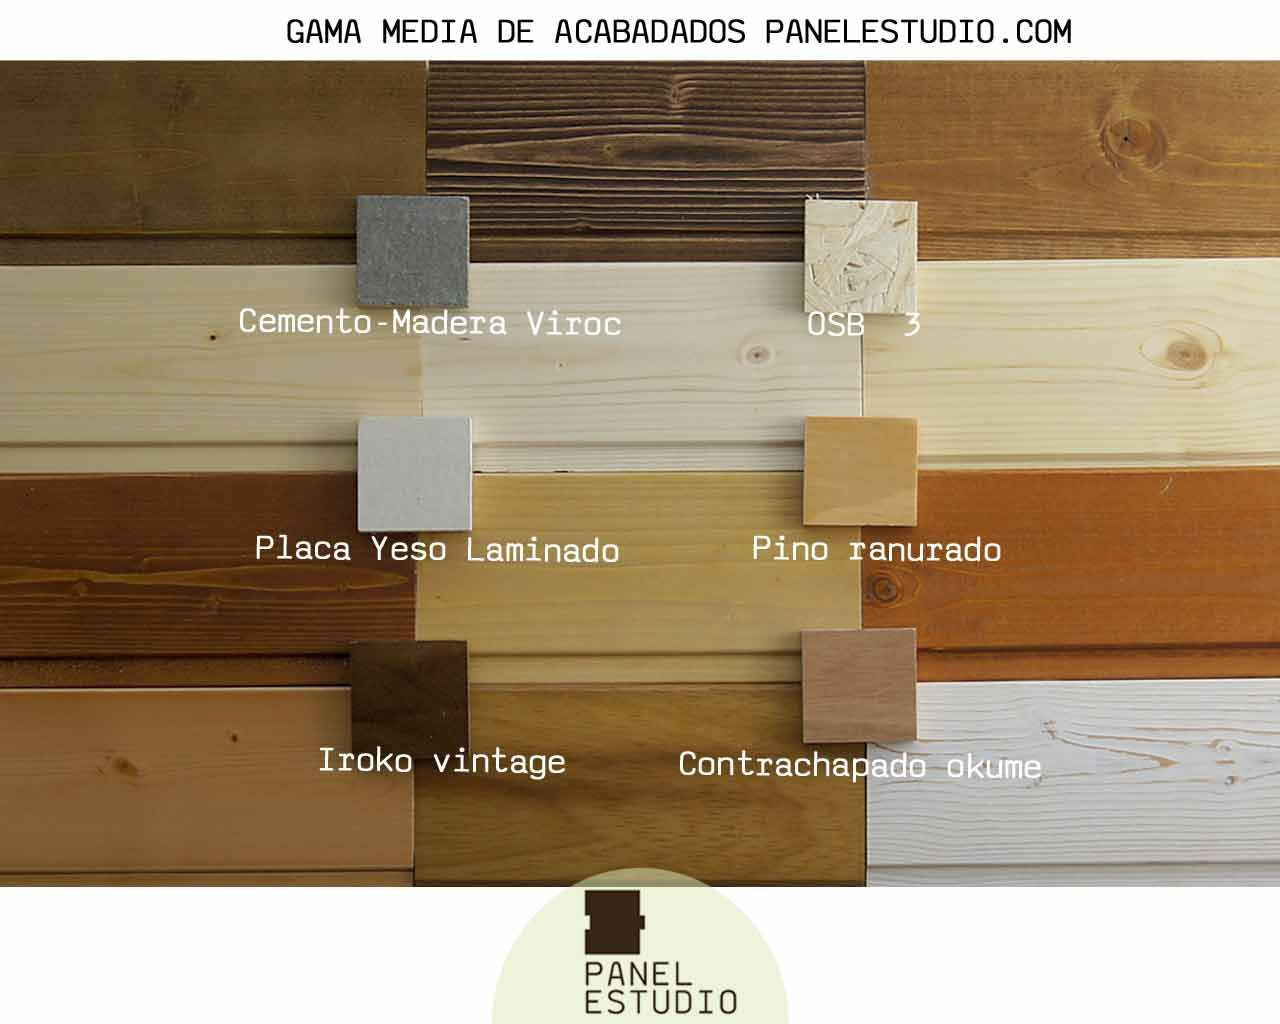 Gama de colores de paneles de madera decorativos gama for Sandwich para tejados de madera